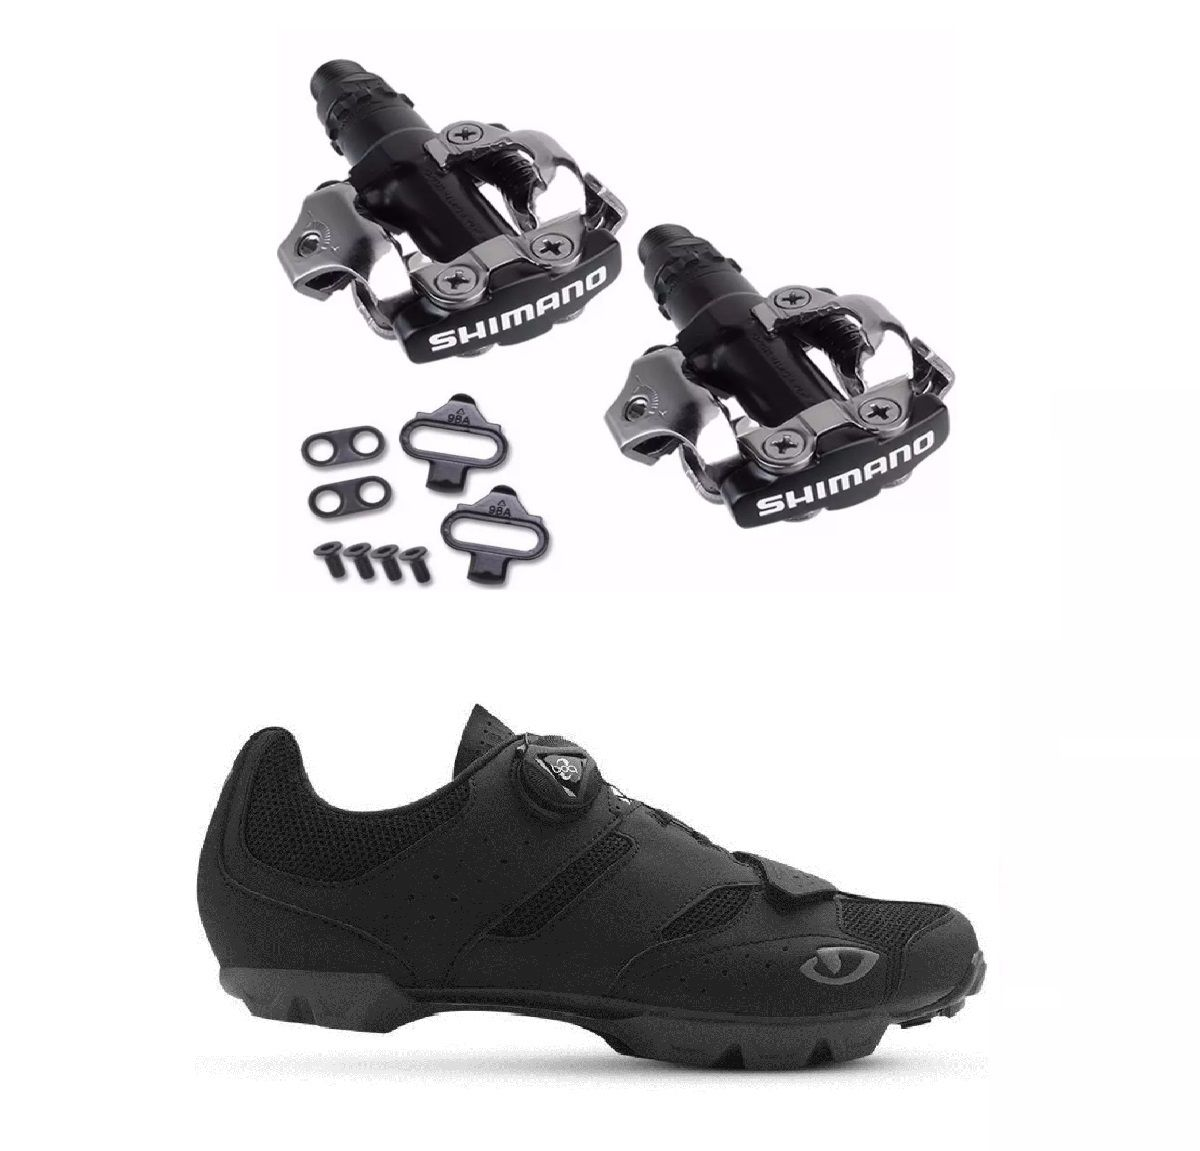 Kit Sapatilha Giro Cylinder + Pedal Clip Shimano PD-M520